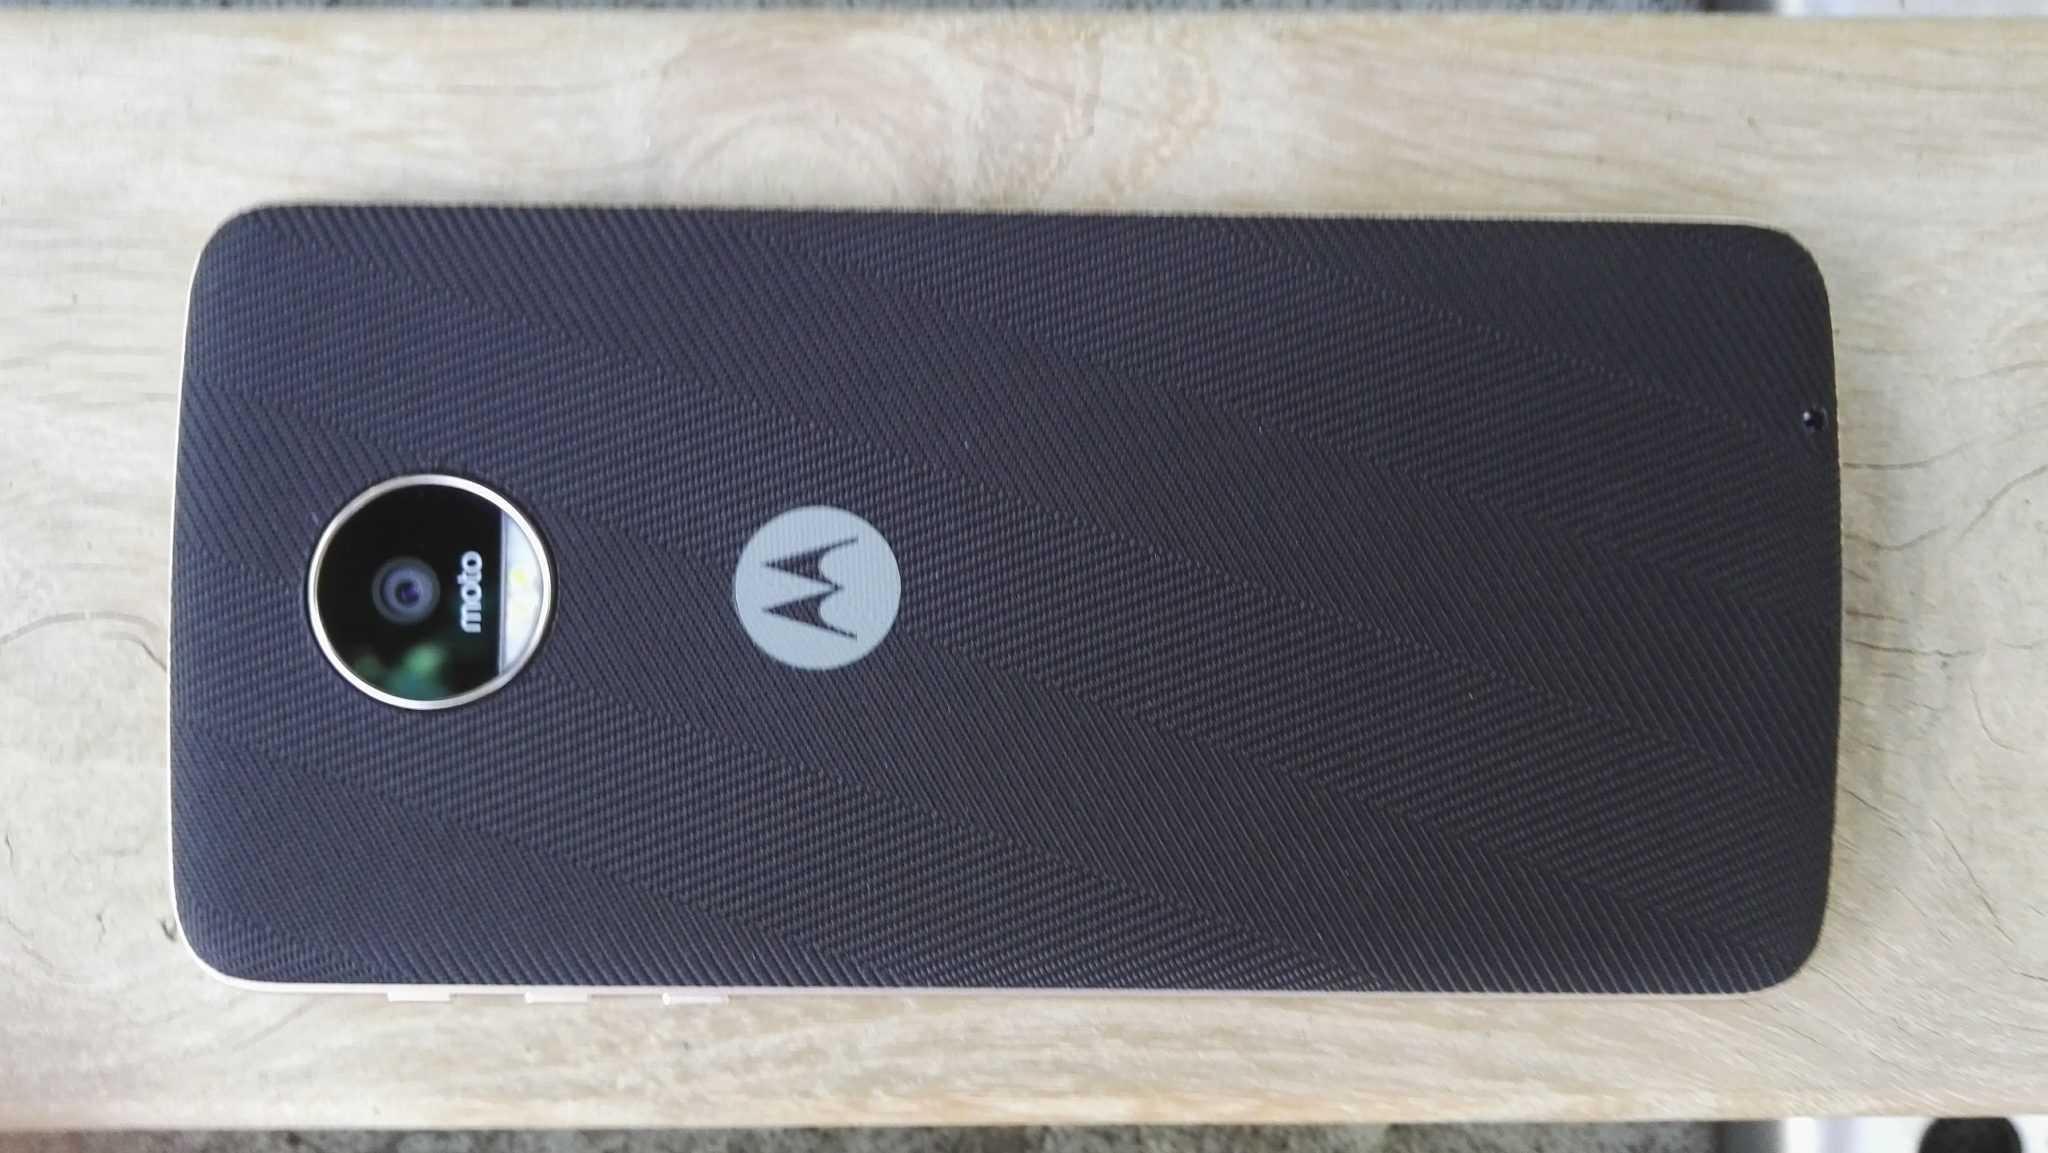 Rückseite mit schwarzem Style Shell